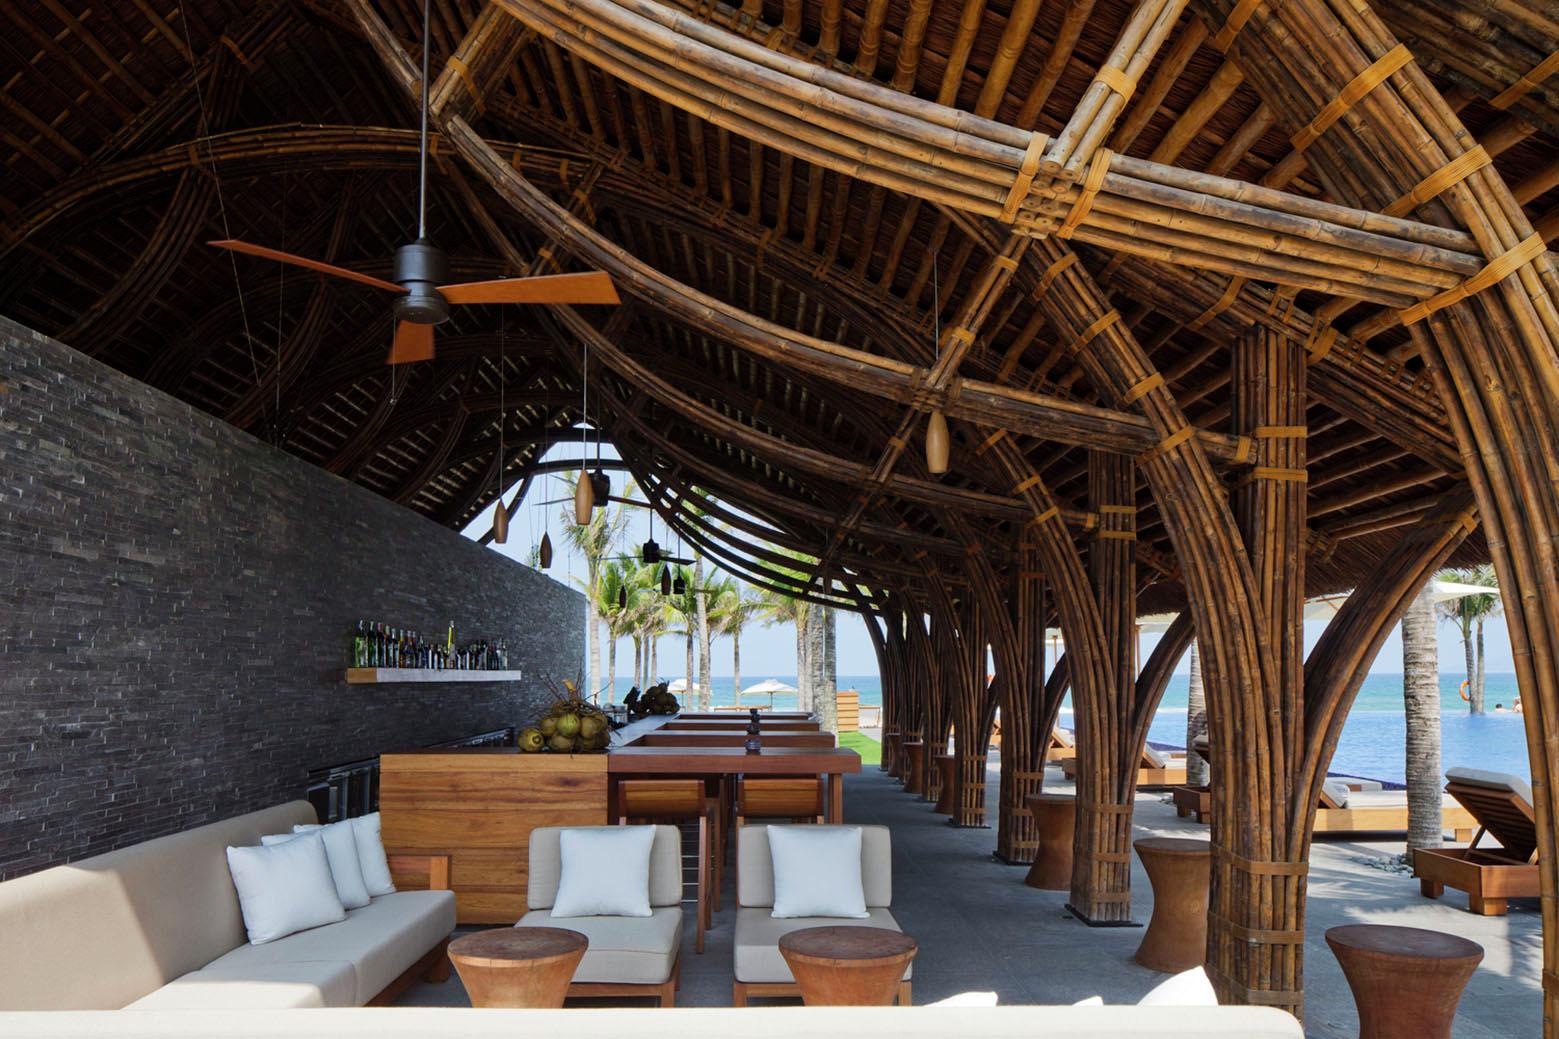 Gallery of naman retreat beach bar vtn architects 3 for Beach bar design